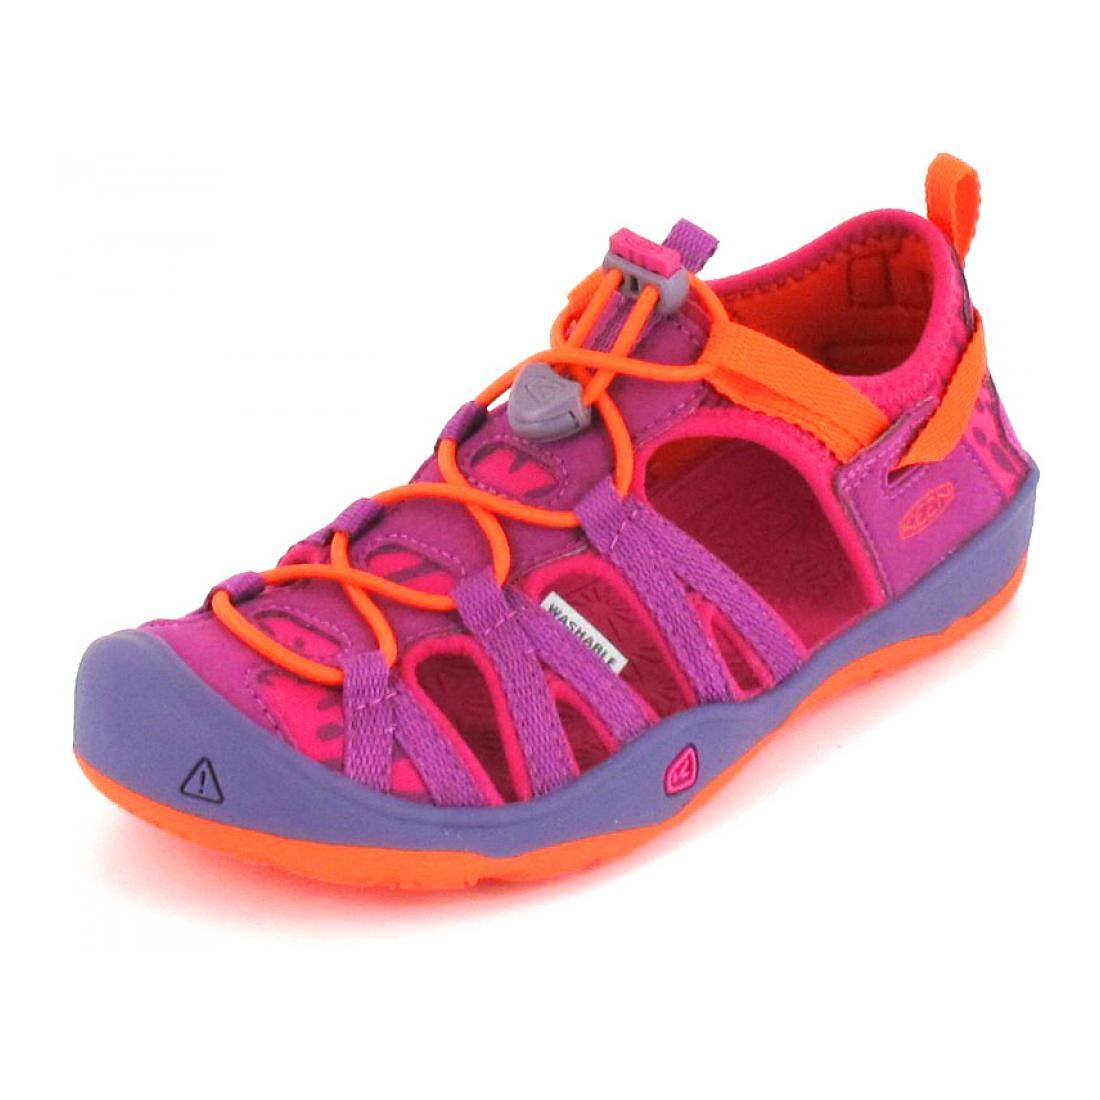 KEEN Sandalette Moxie Sandal Y